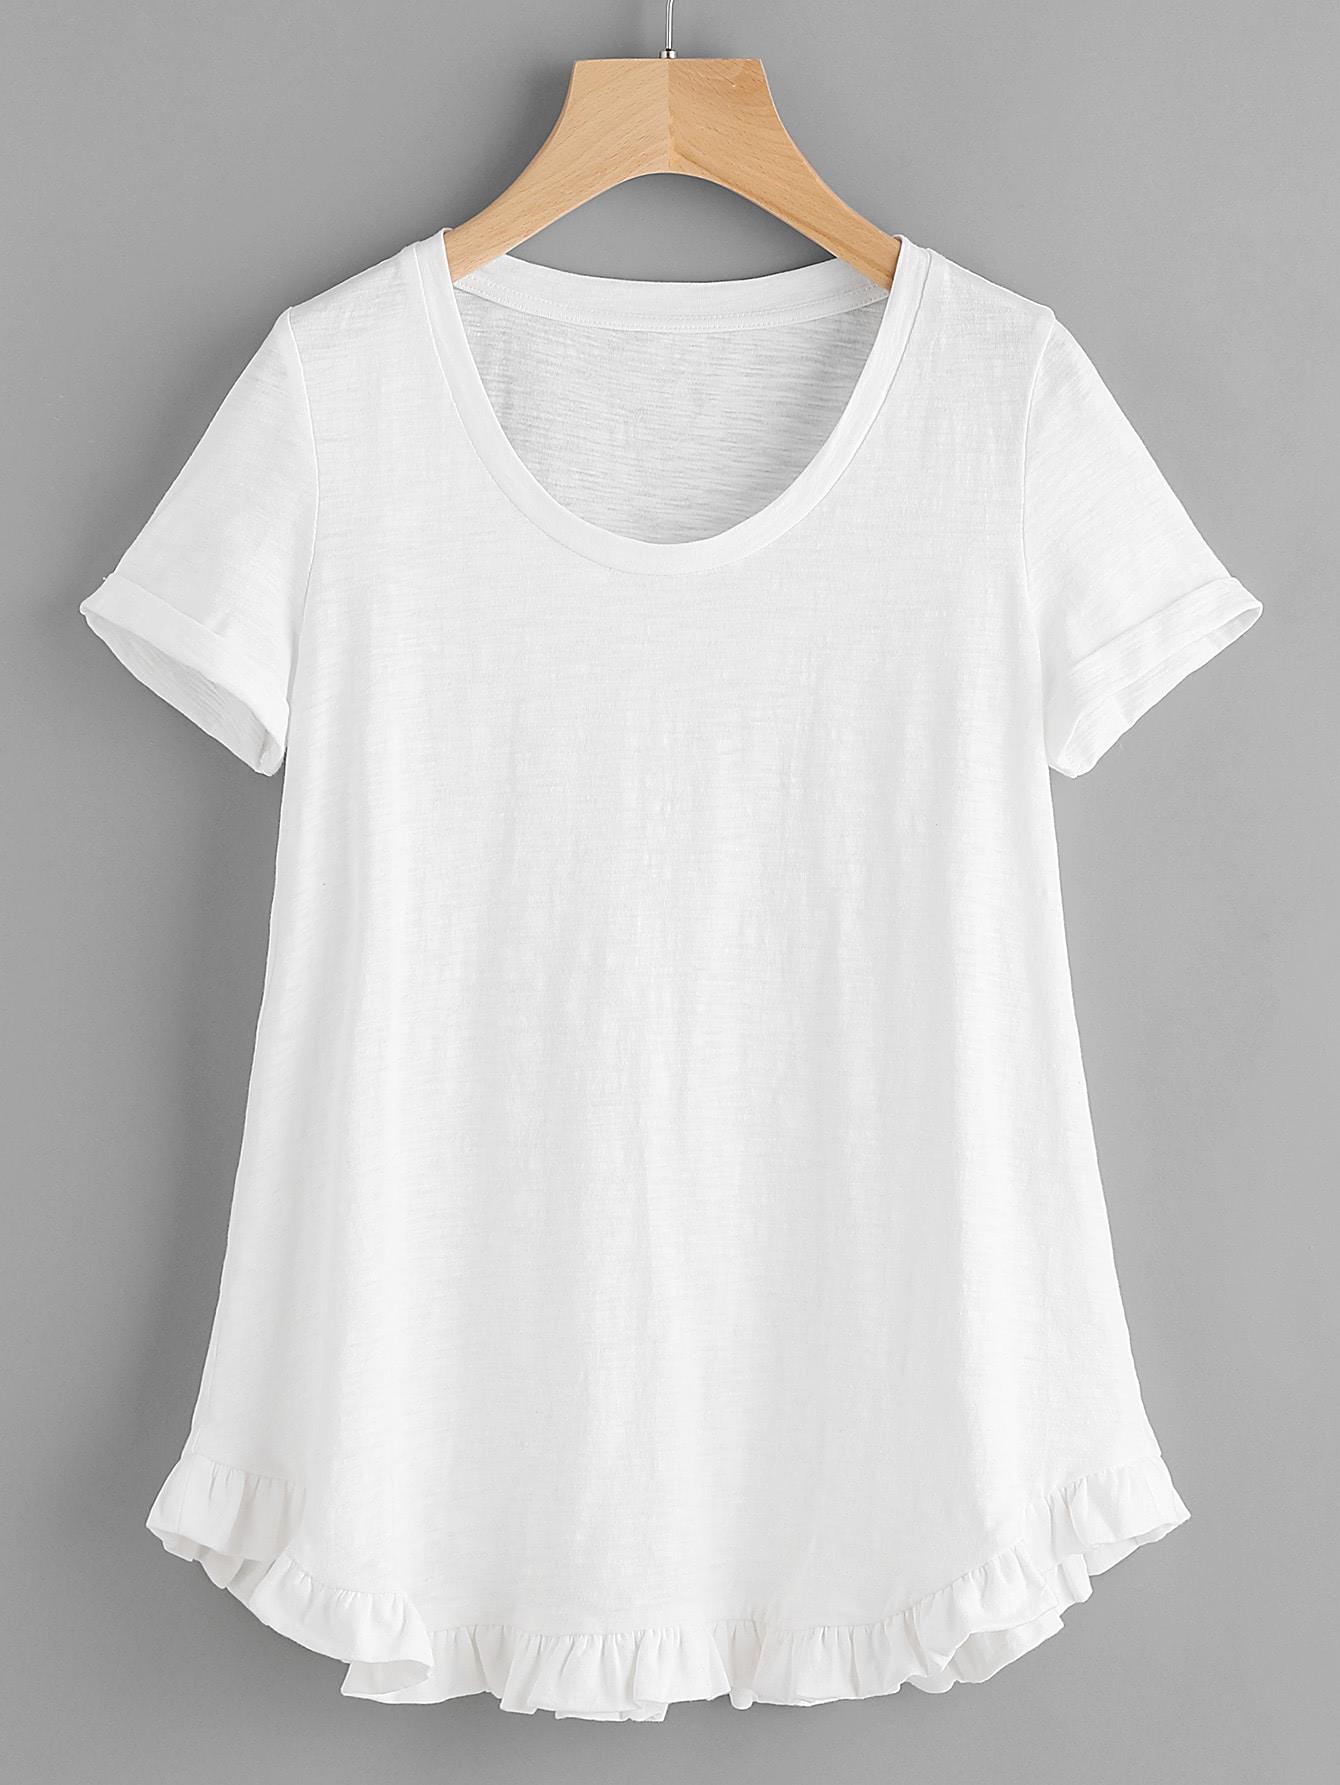 Roll Cuff Ruffle Trim Slub T-shirt asymmetrical ruffle trim t shirt